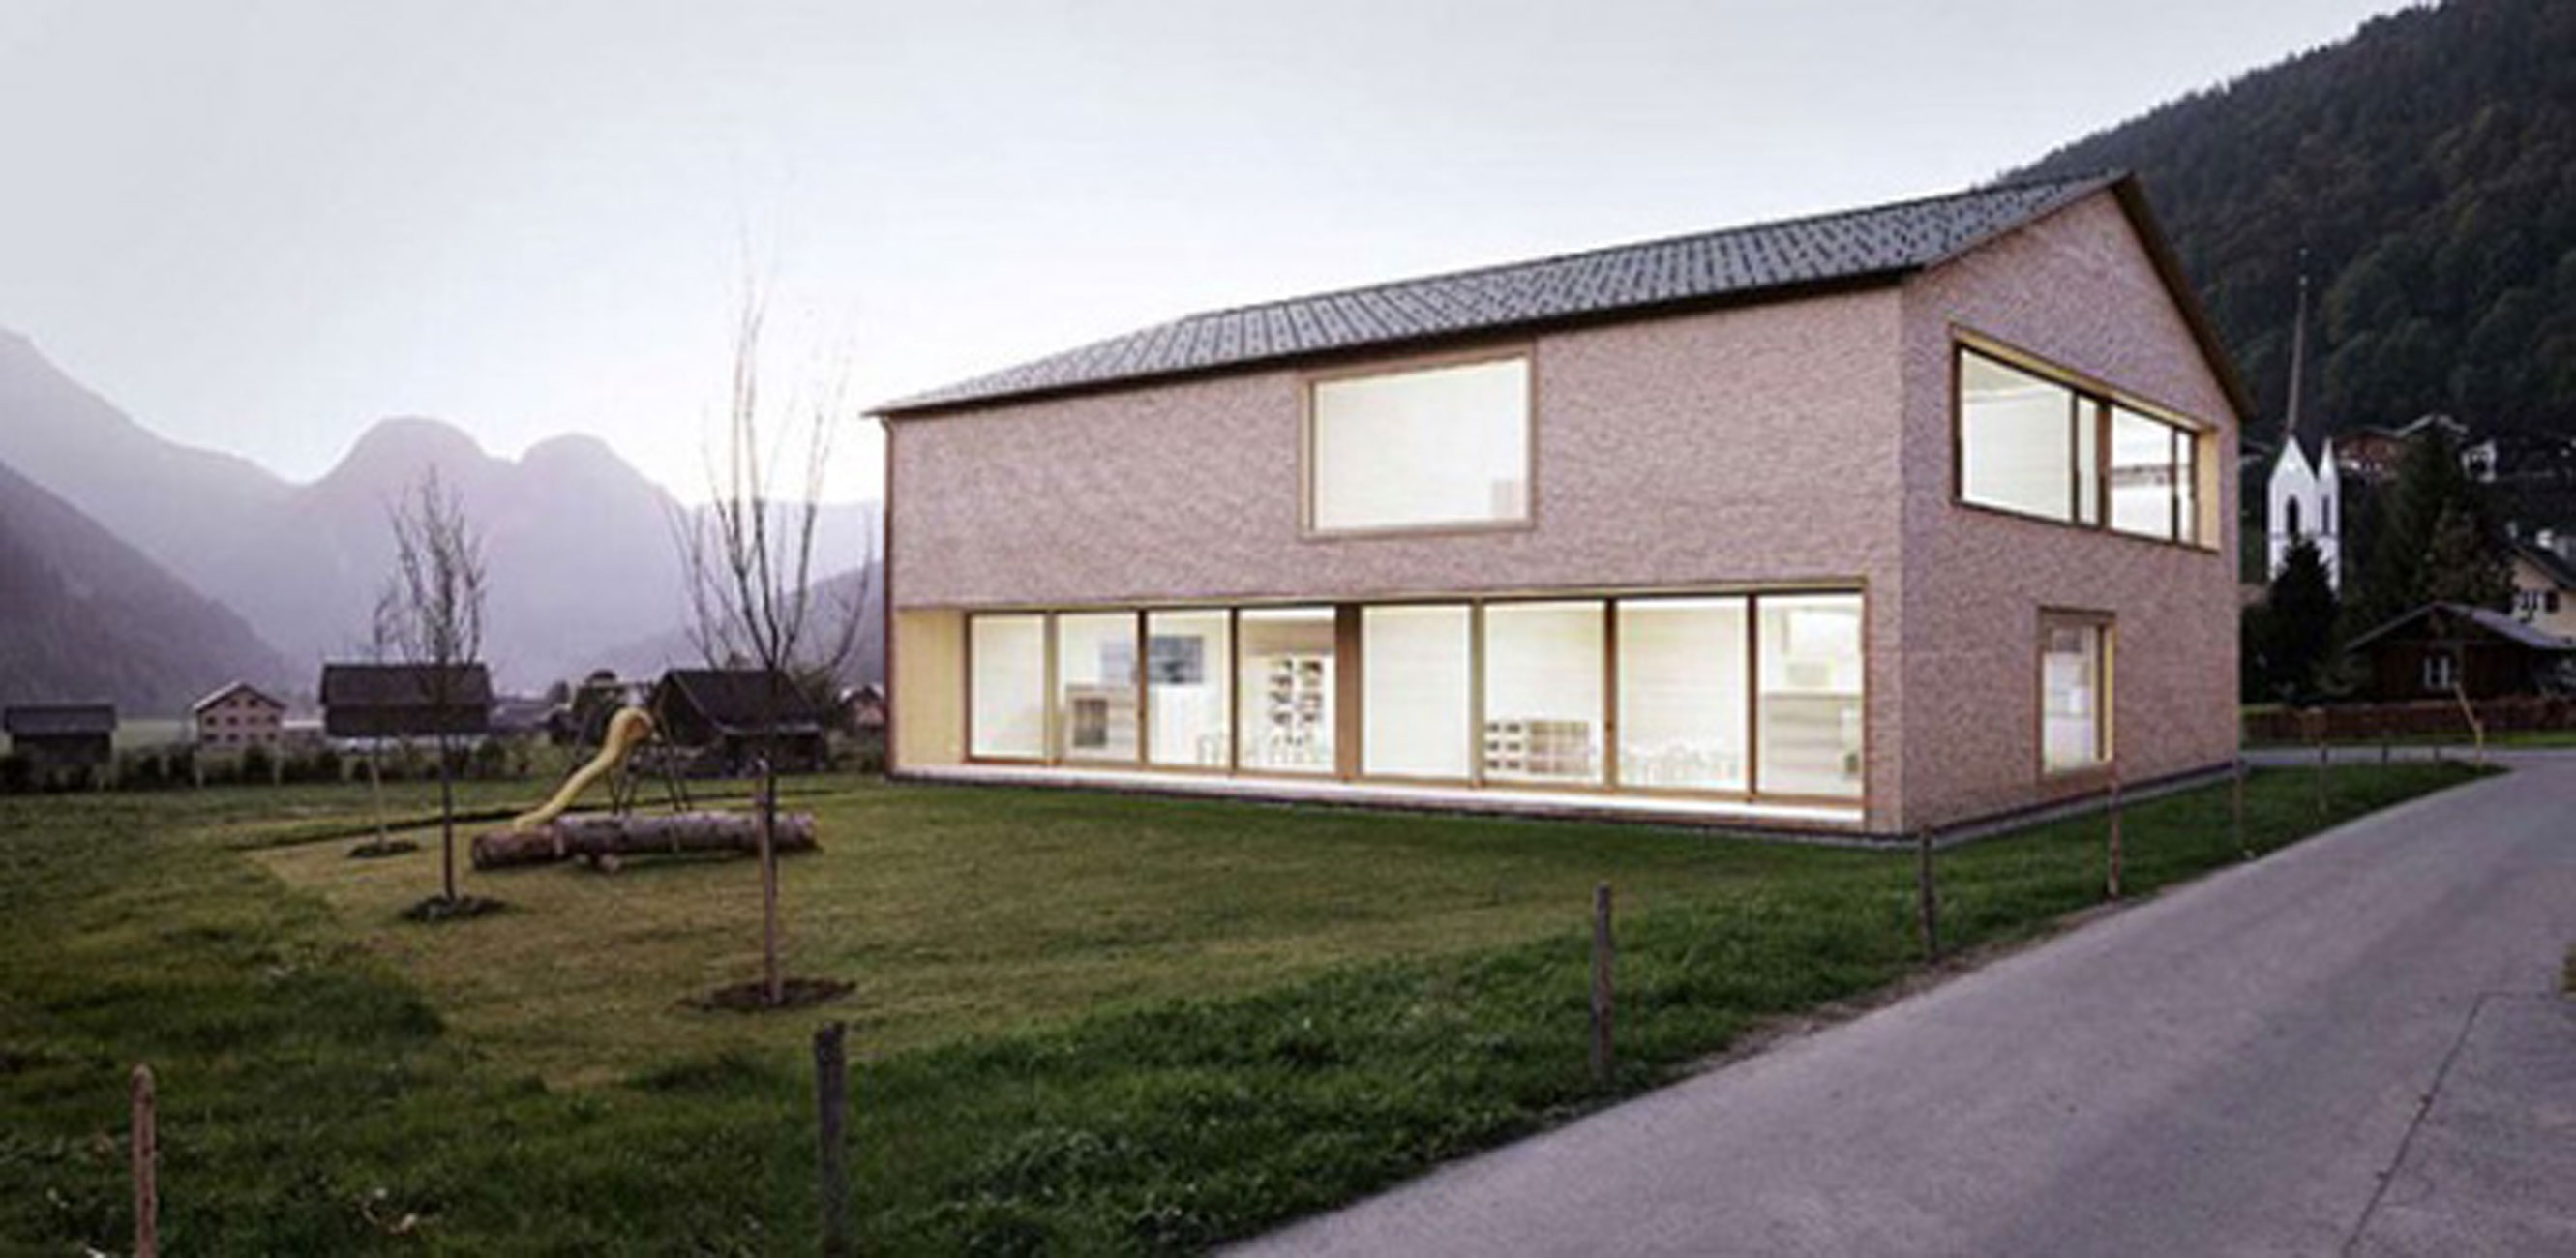 Minimalist Wooden House Ideas By Bernardo Bader Home Architecture